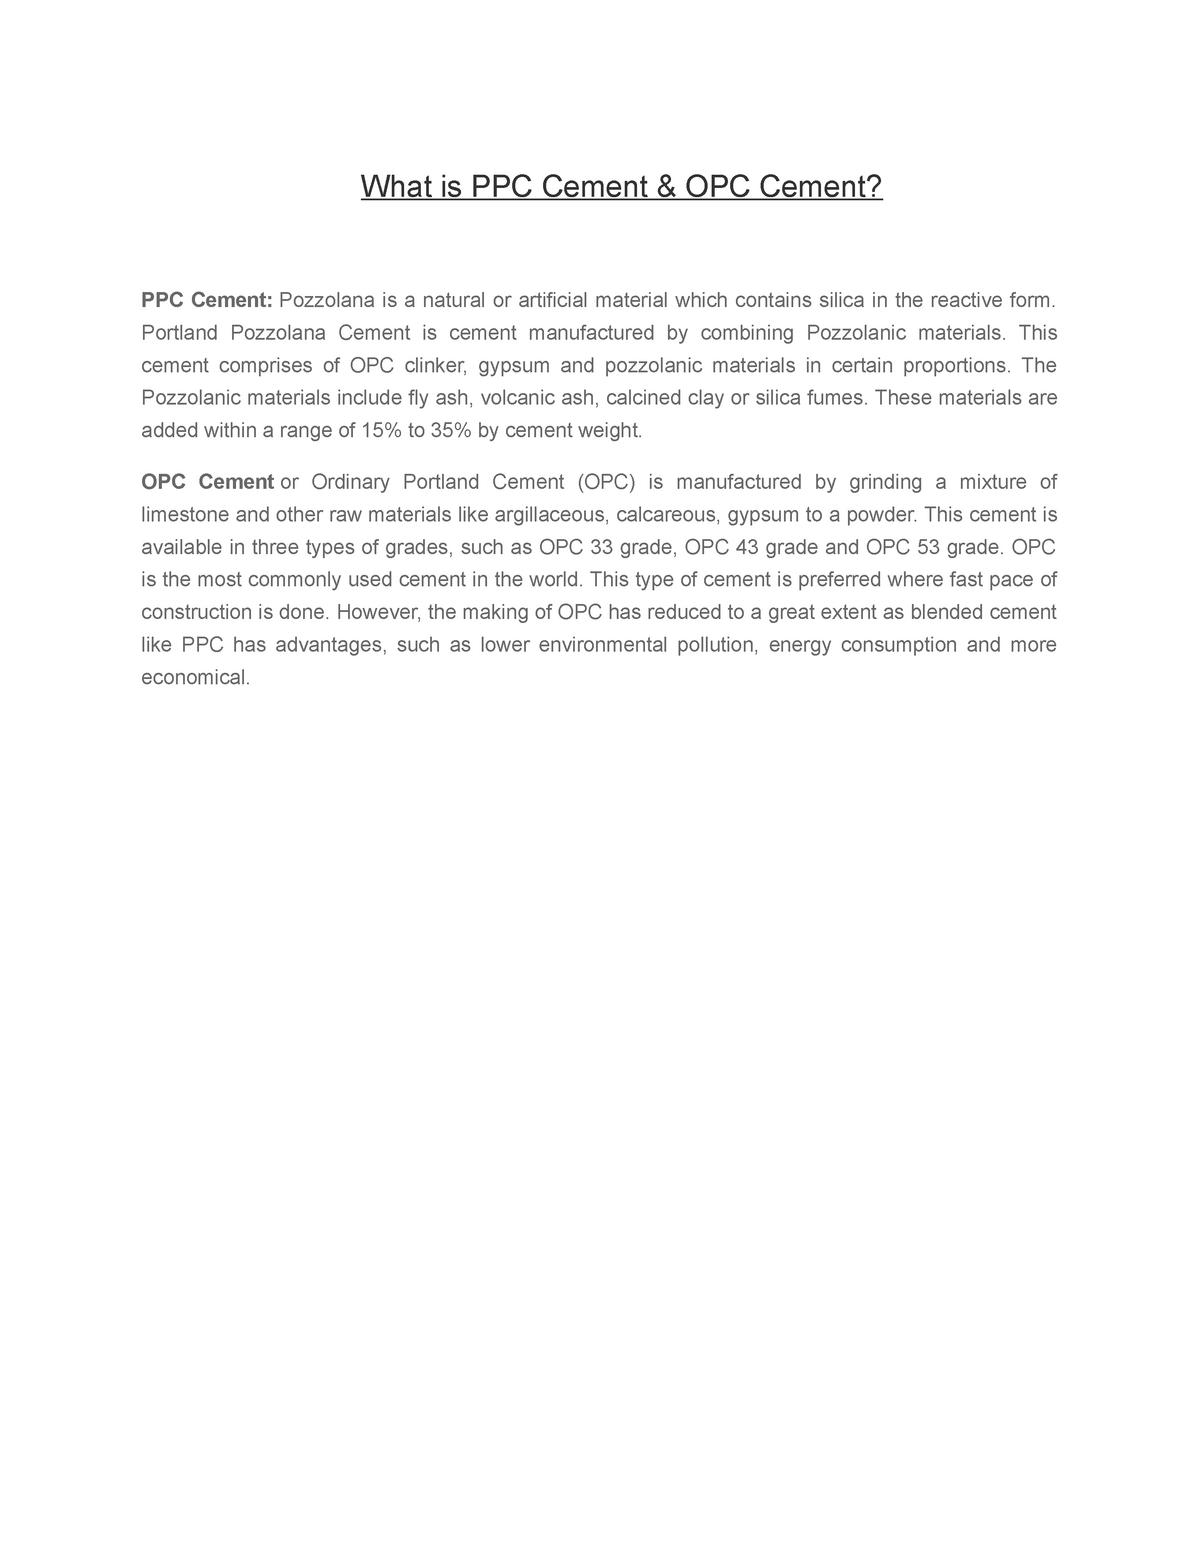 What is PPC & OPC Cement - Professor Saiful bari - ME-233